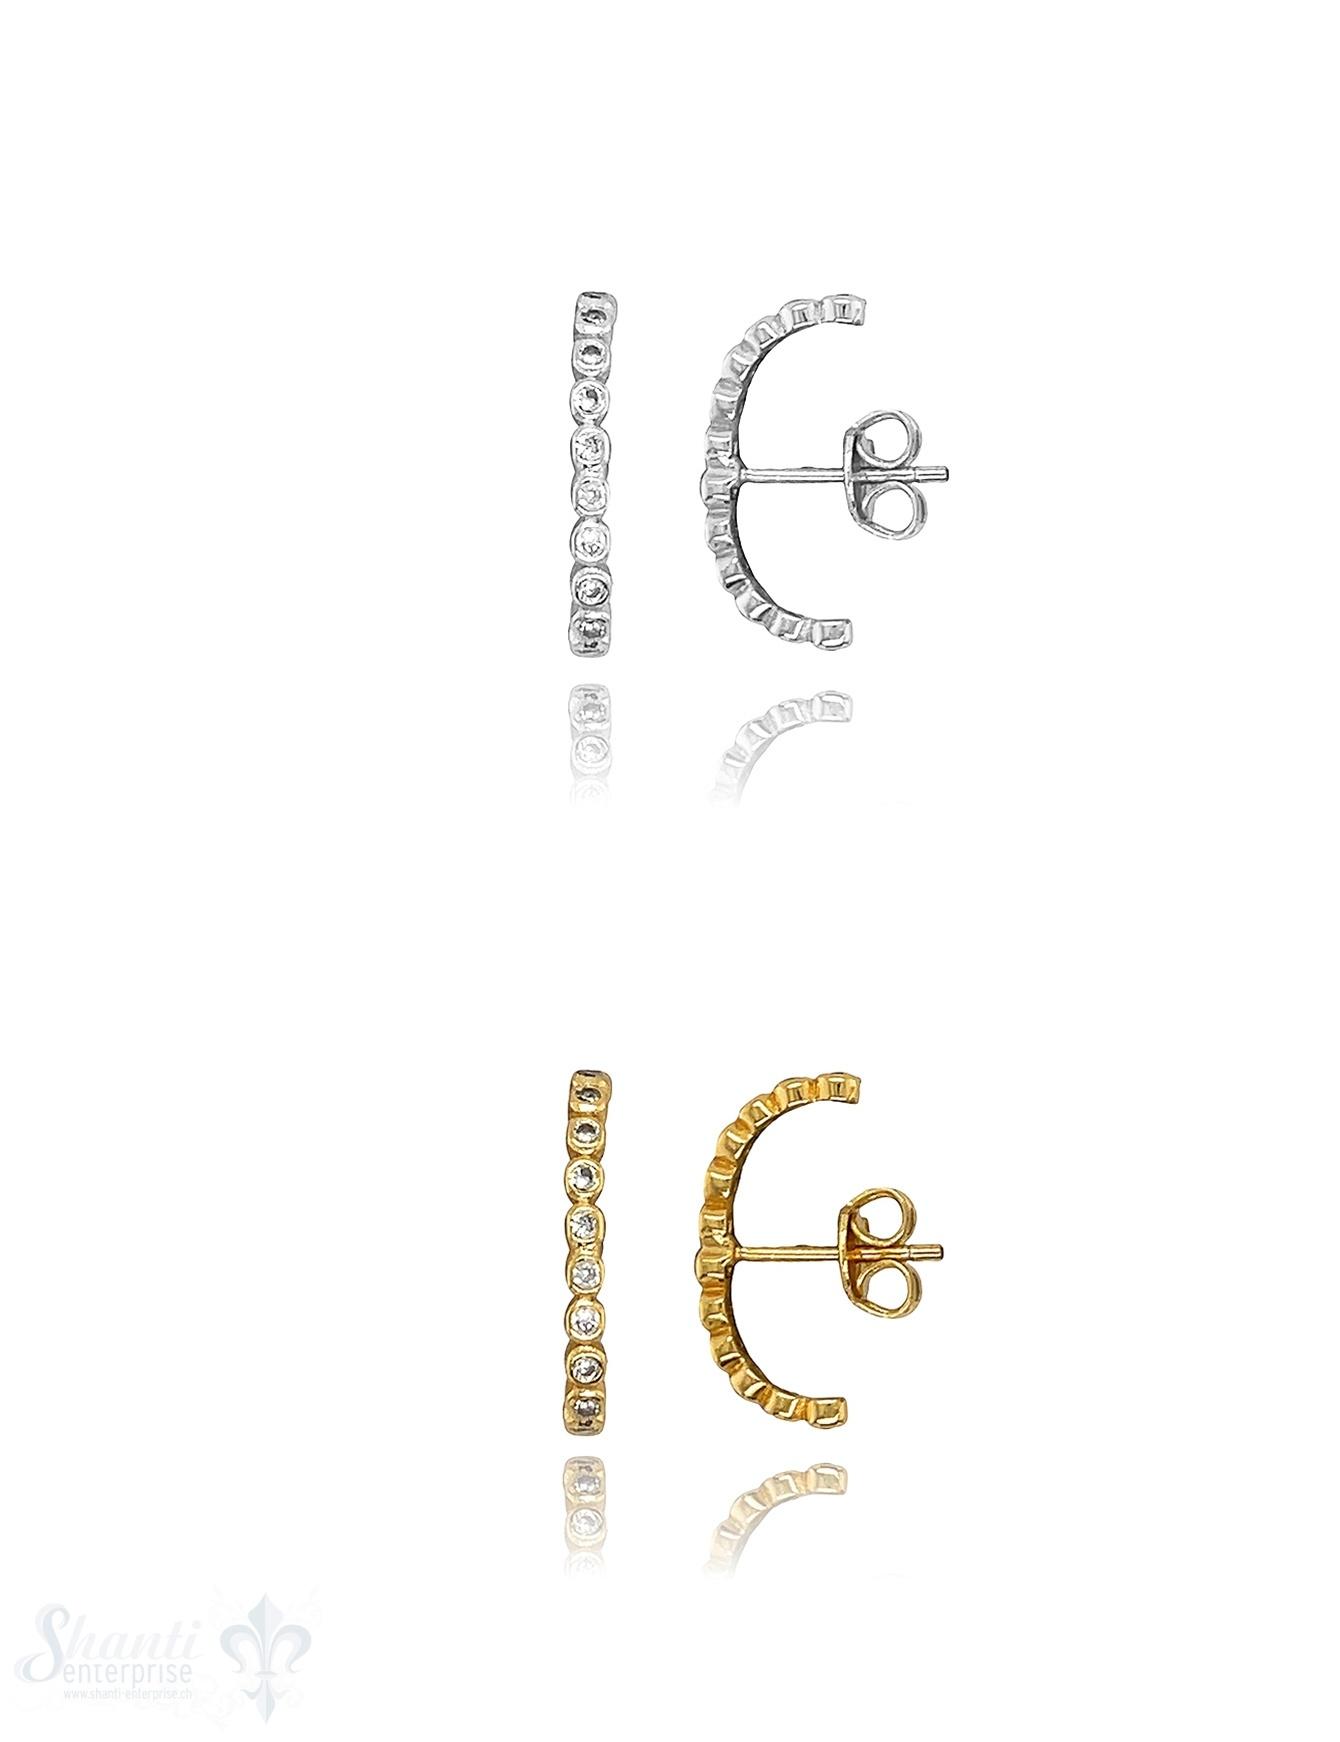 Zirkonia weiss Bügel Ohrstecker 16 mm 1,9 mm breit Silber (für Ohrkante) ec